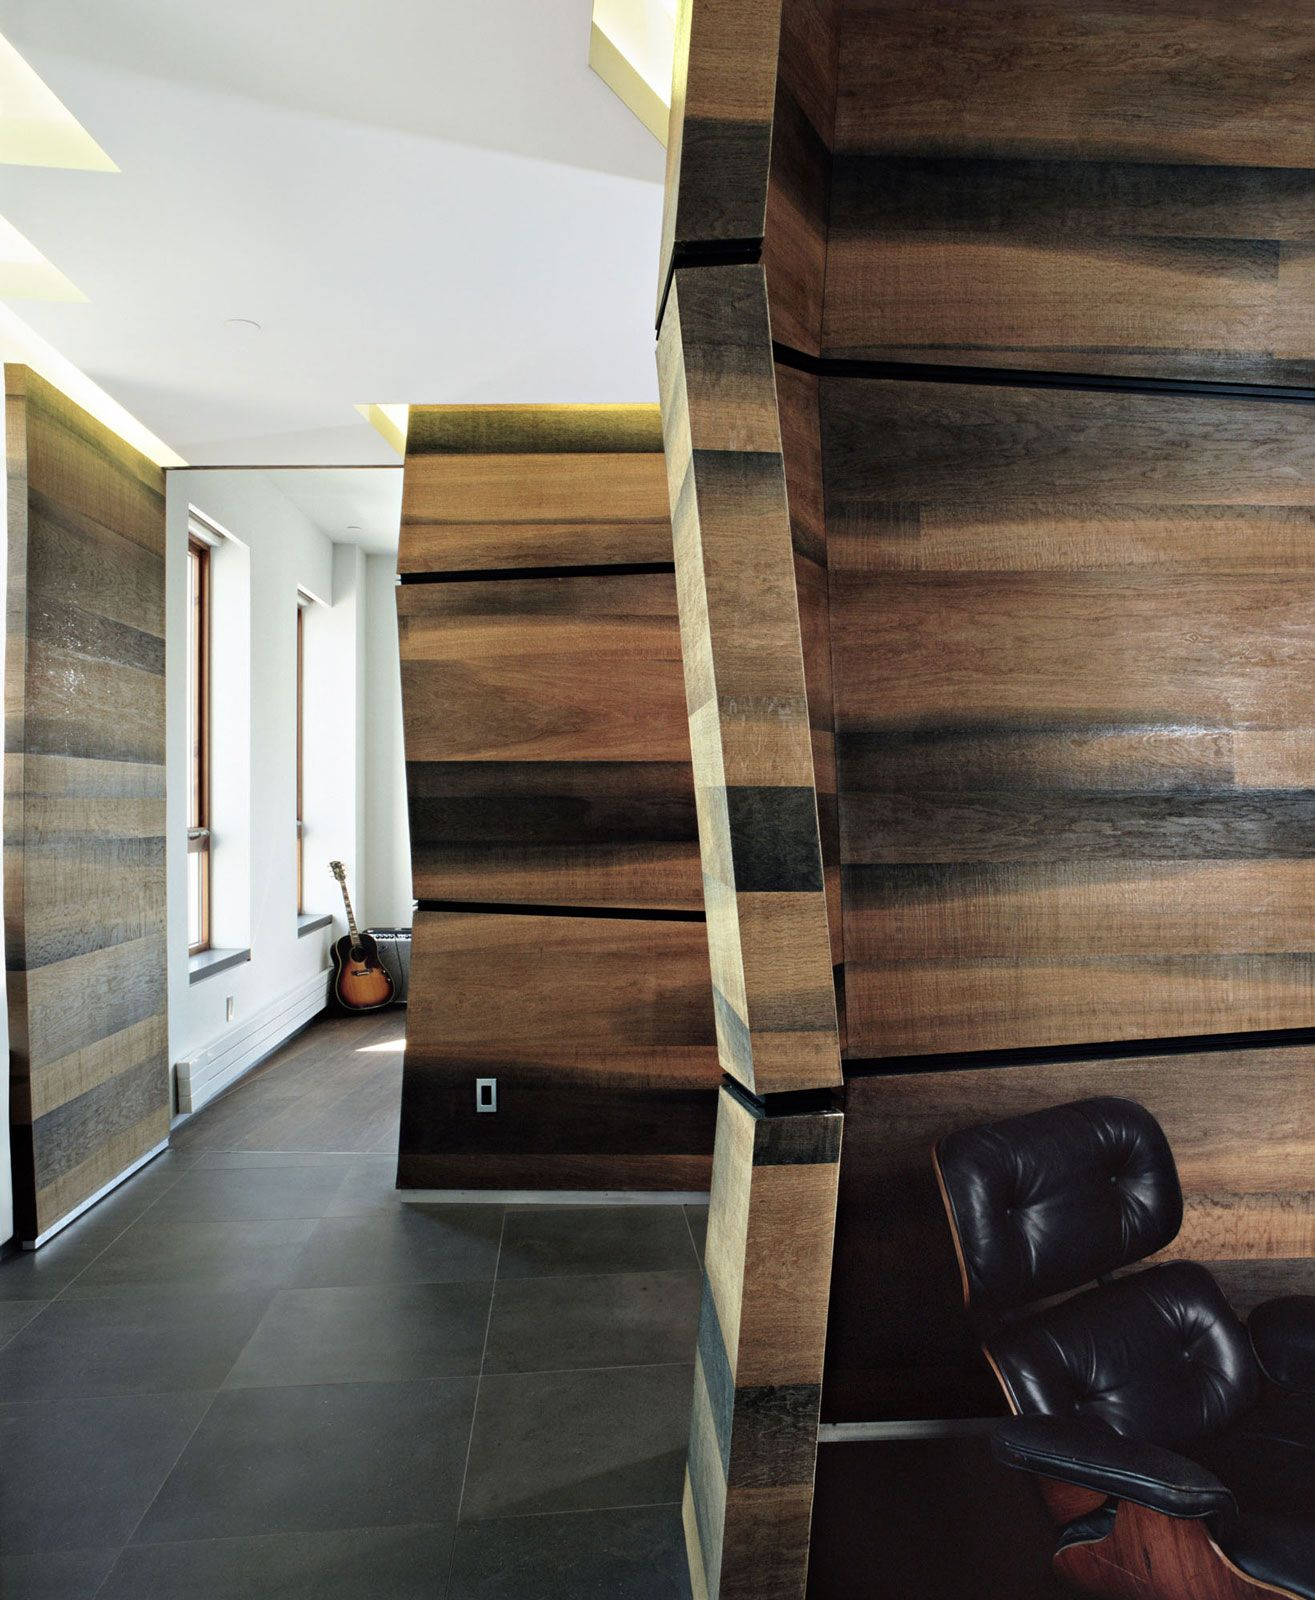 Classy Design Wood Loft Wall Interior Design In A Former Warehous Schein  Loft By Archi